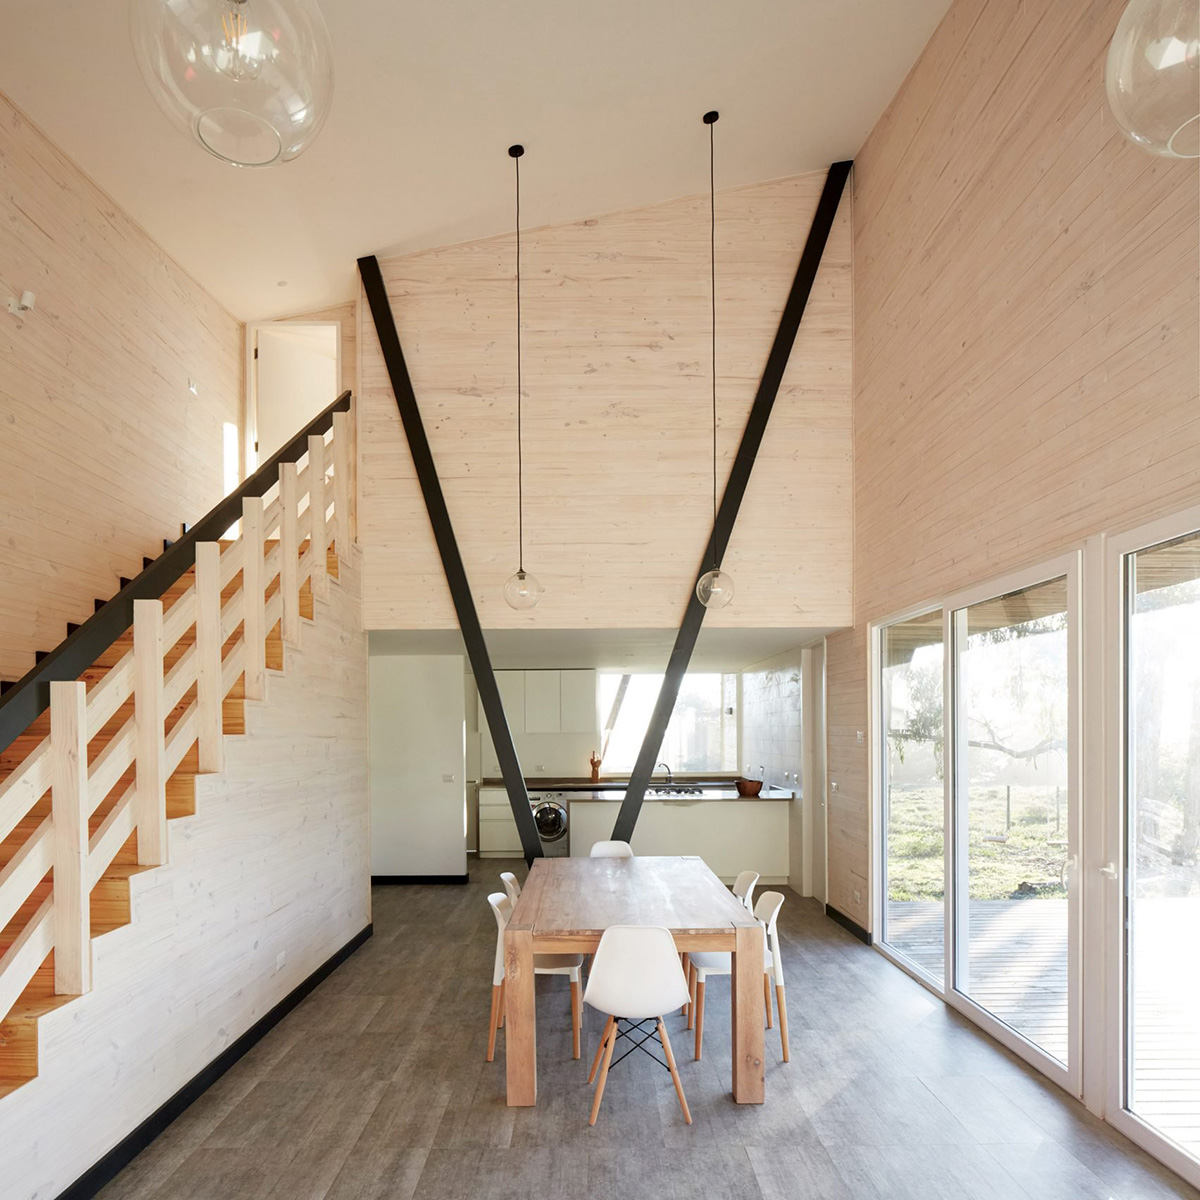 07-arquitectura-chilena-casa-dos-pieles-veronica-arcos-foto-cristobal-palma